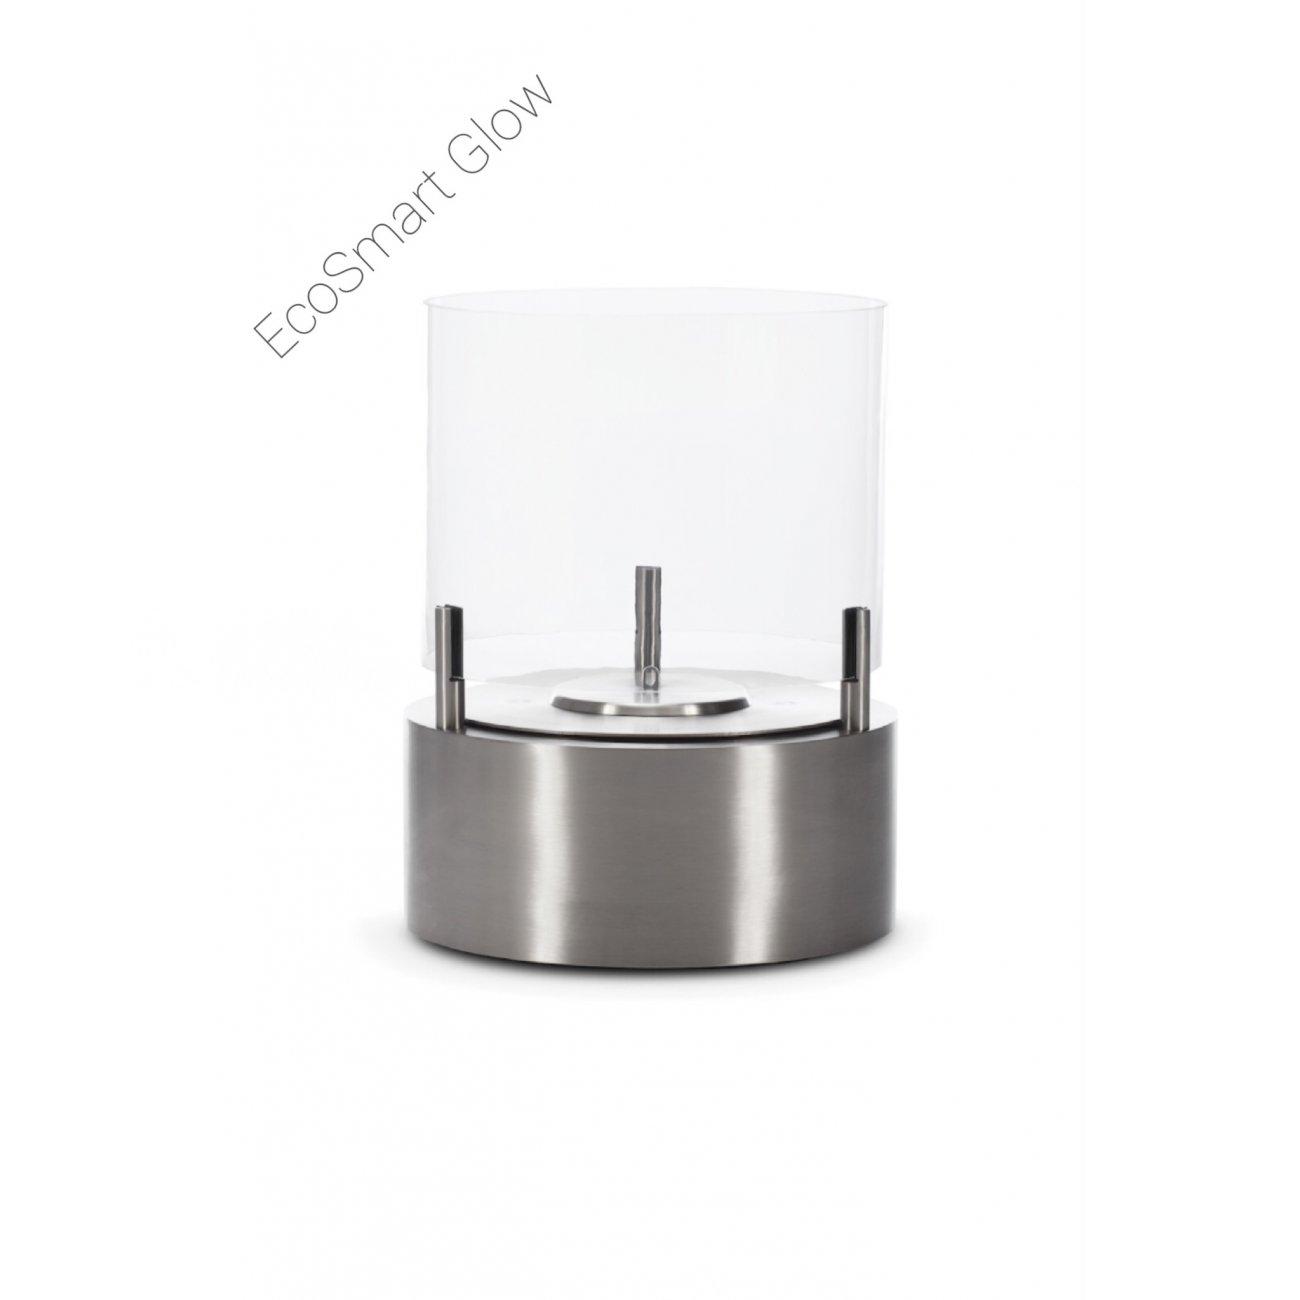 ethanol kamin ecosmart cyl glow f r au en. Black Bedroom Furniture Sets. Home Design Ideas